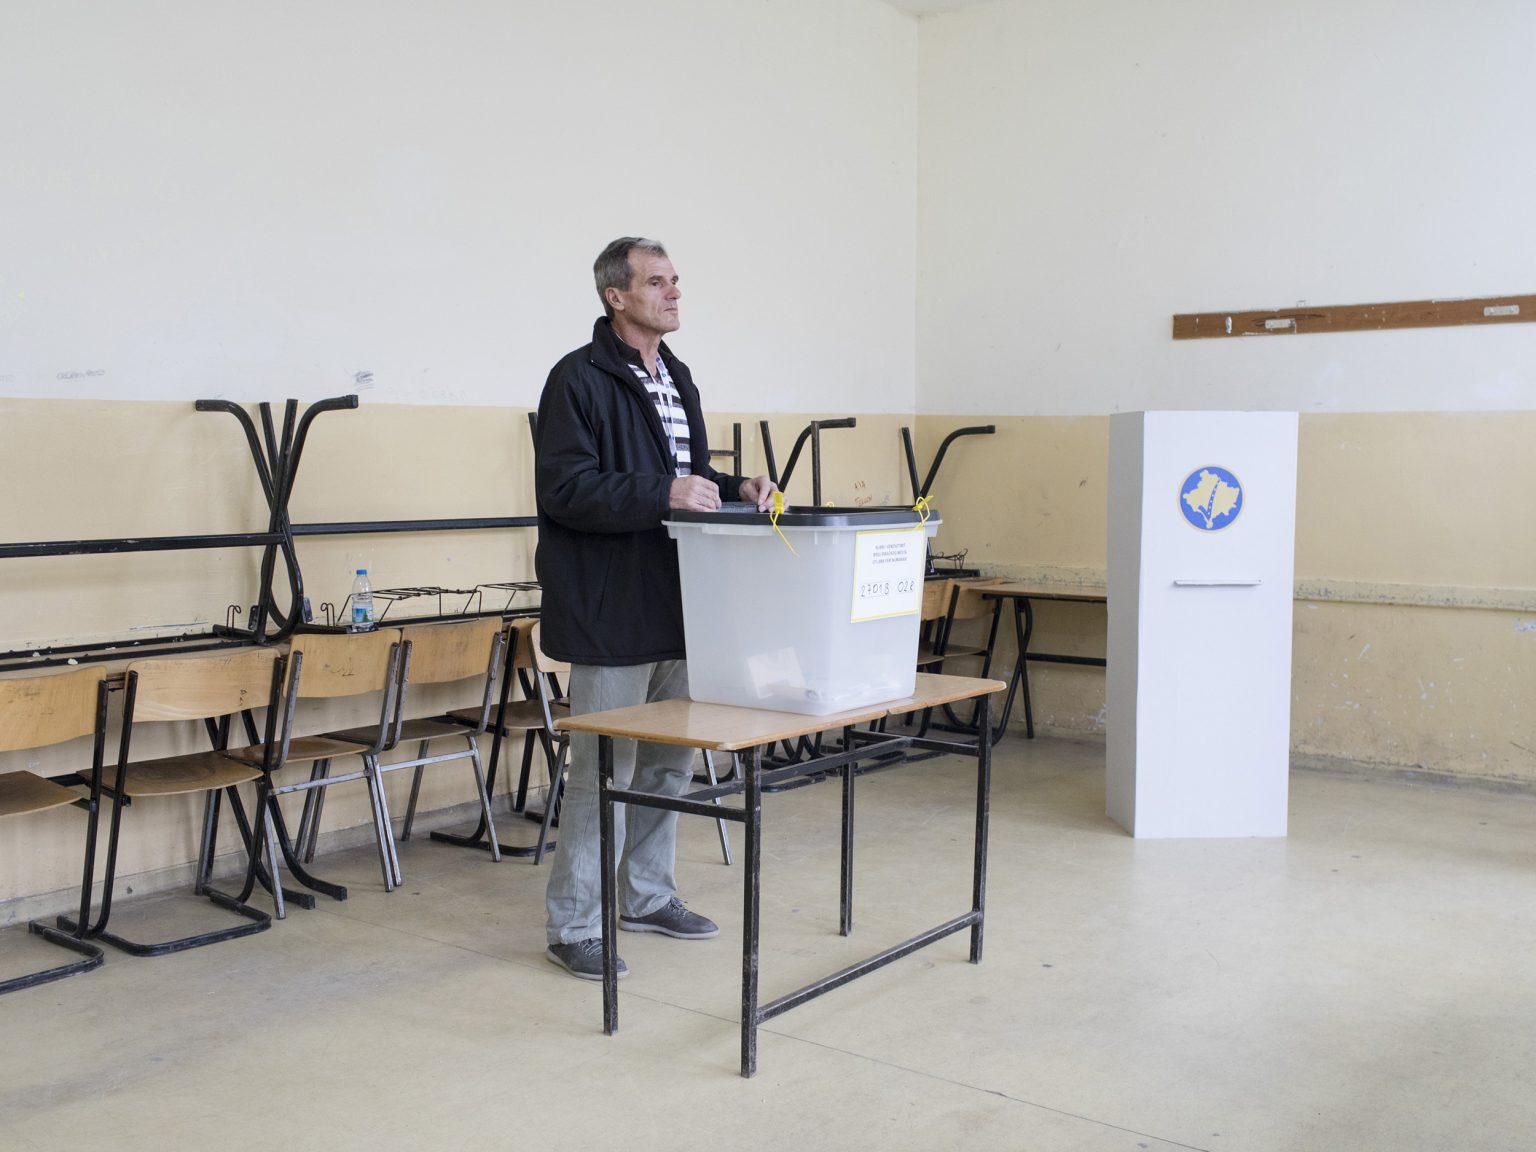 "Inside the polling station n.2 at the ""Lutfi Musiqi"" school in Vushtrri / Vučitrn, around 28km North of Prishtina / Priština, during the ballot vote for the election of the new mayor."